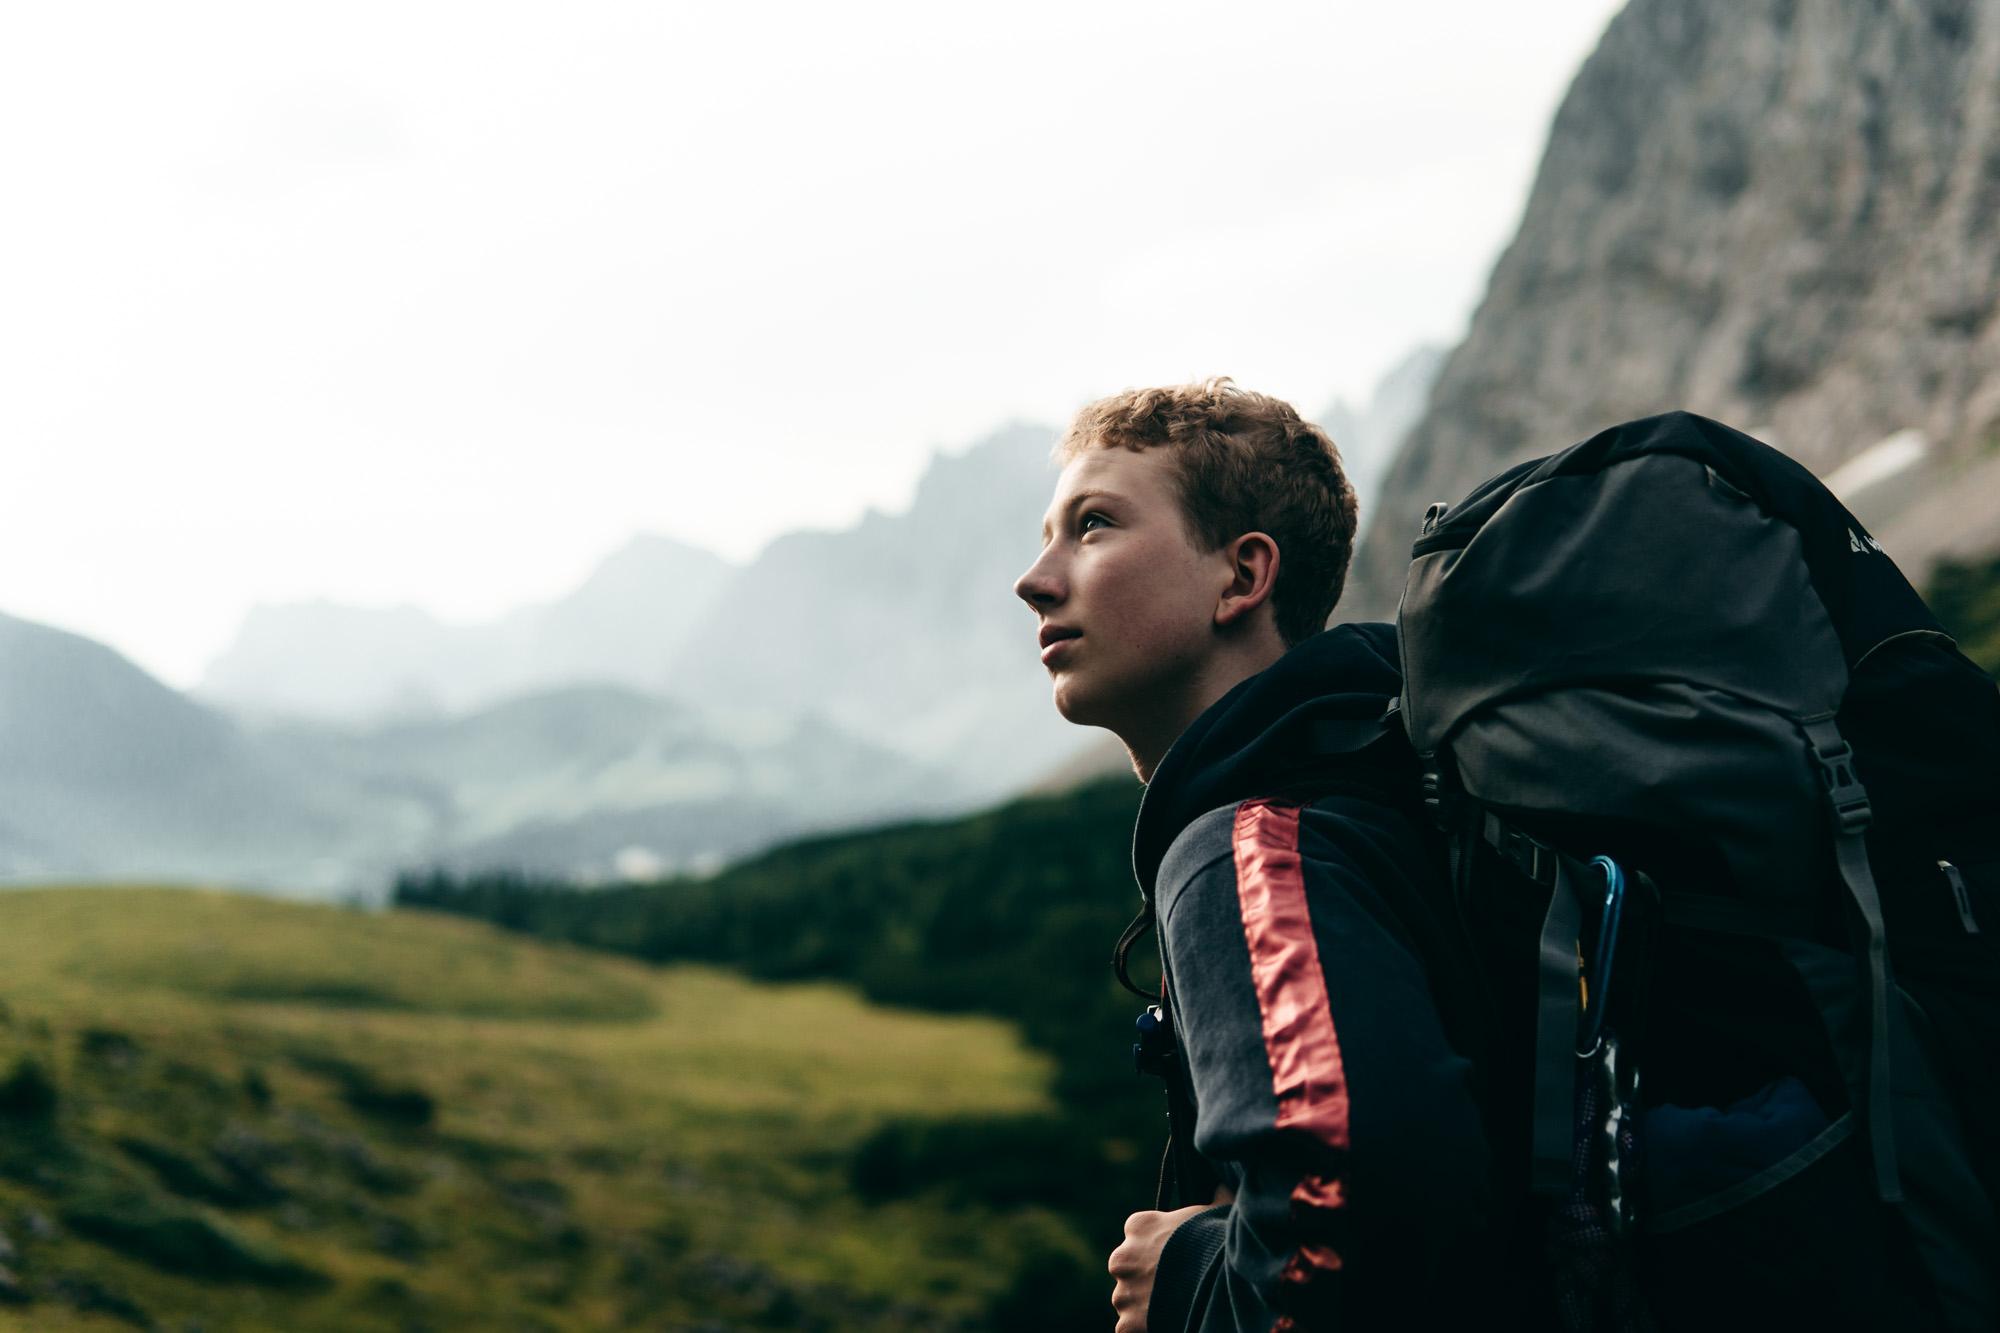 Junger Wanderer vor Alpenpanorama